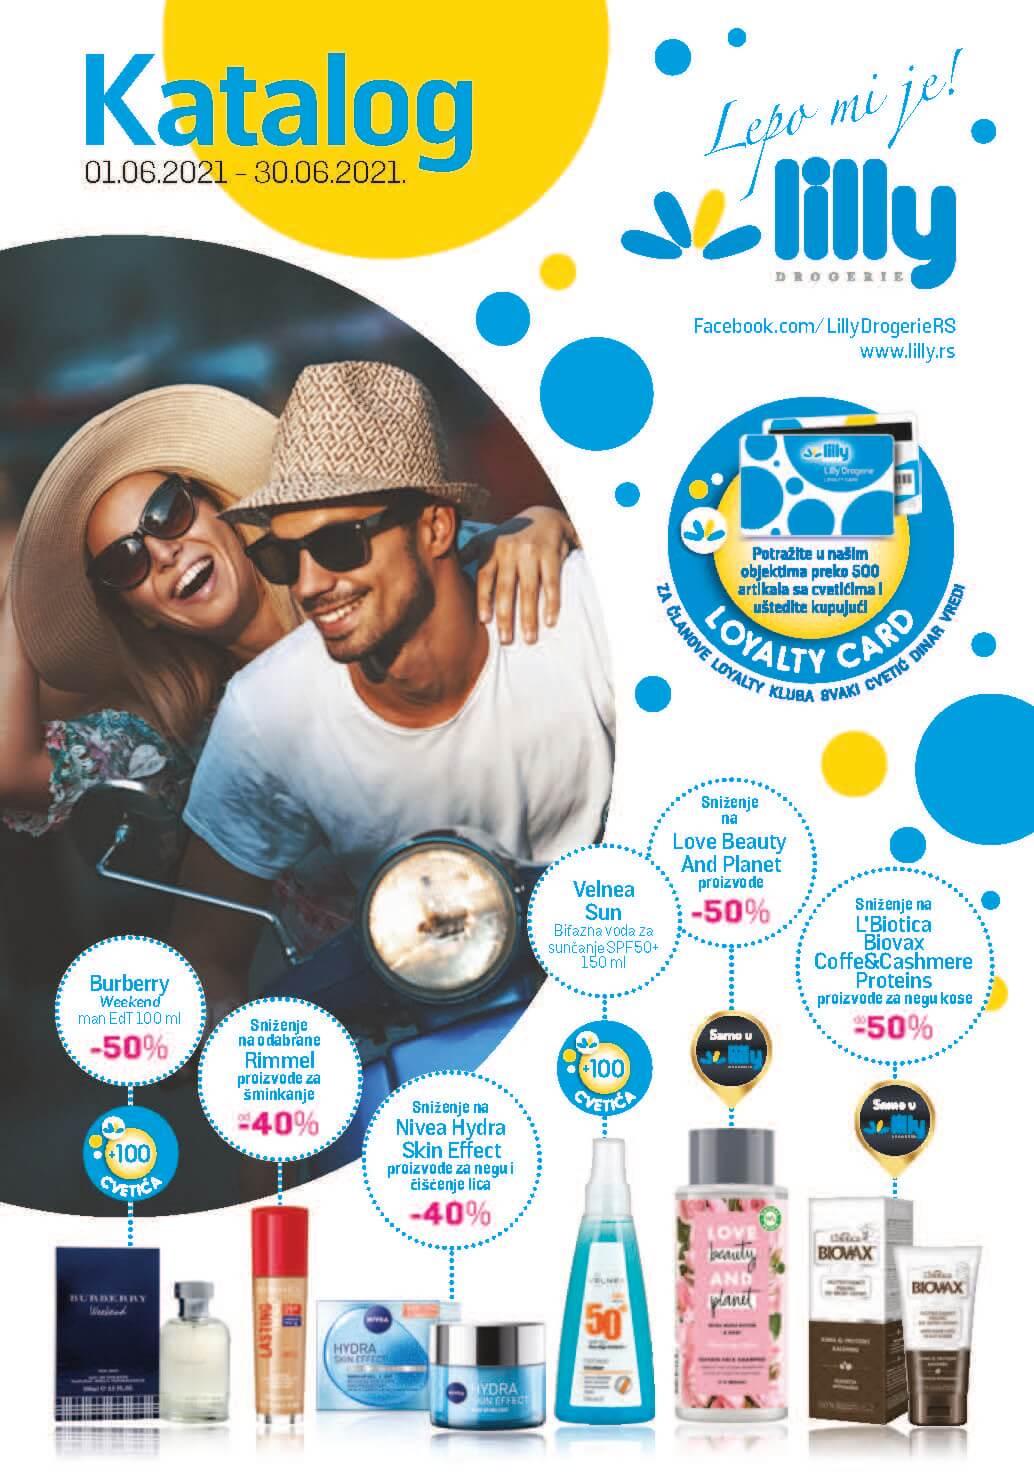 LILLY Katalog LILLY ONLINE Akcija JUN 2021 01.06.2021. 30.06.2021. eKatalozi.com PR Page 01